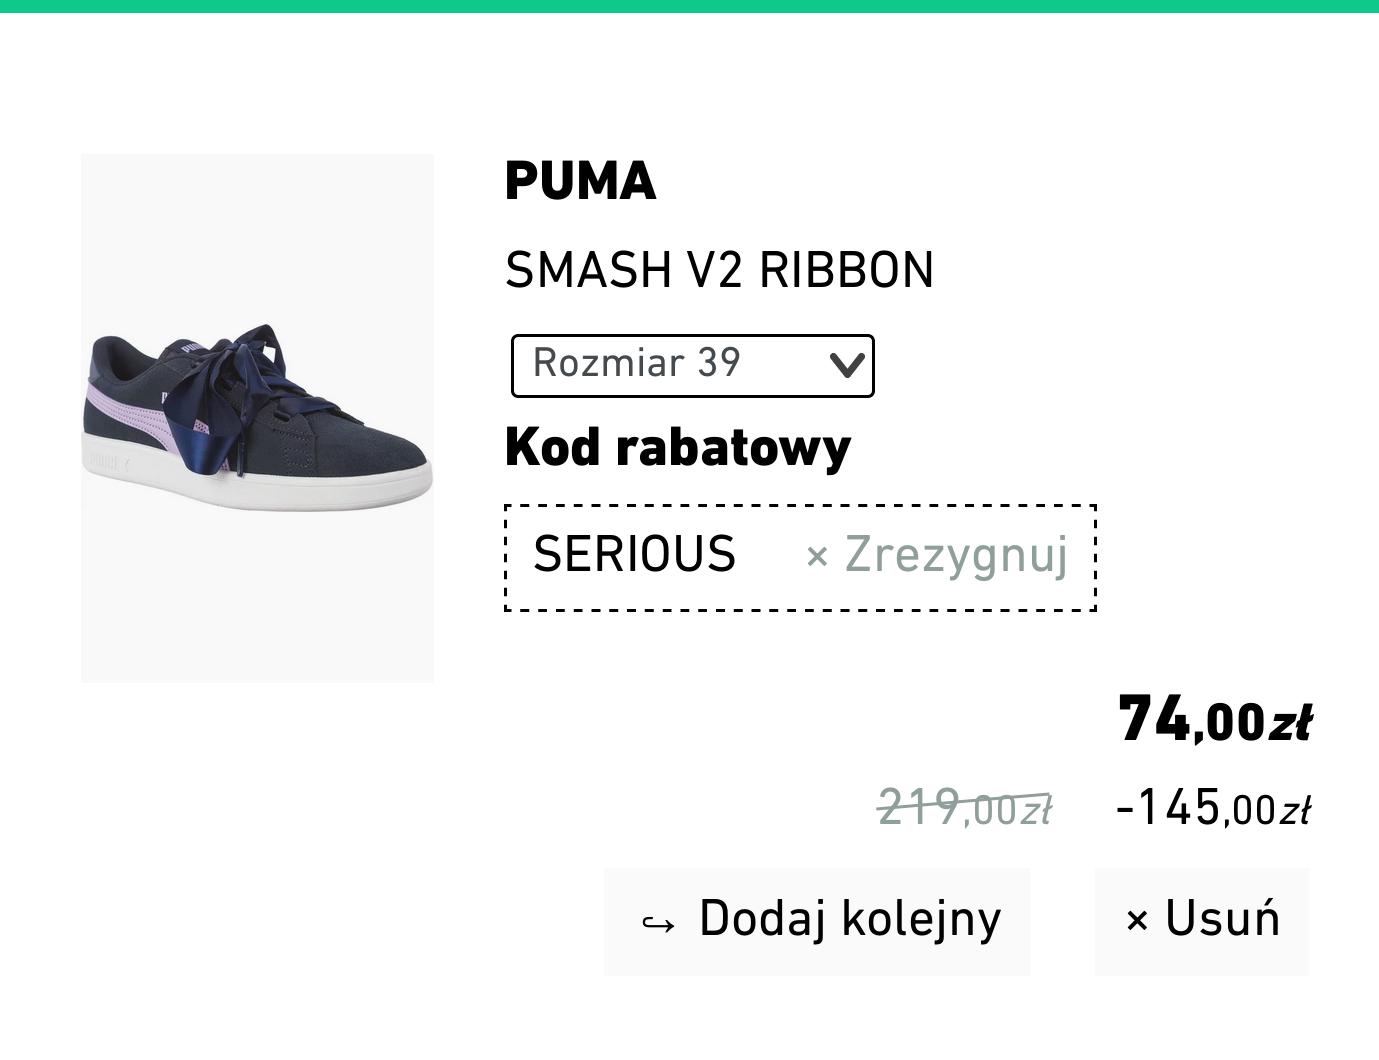 Damskie buty PUMA Smash V2 ribbon